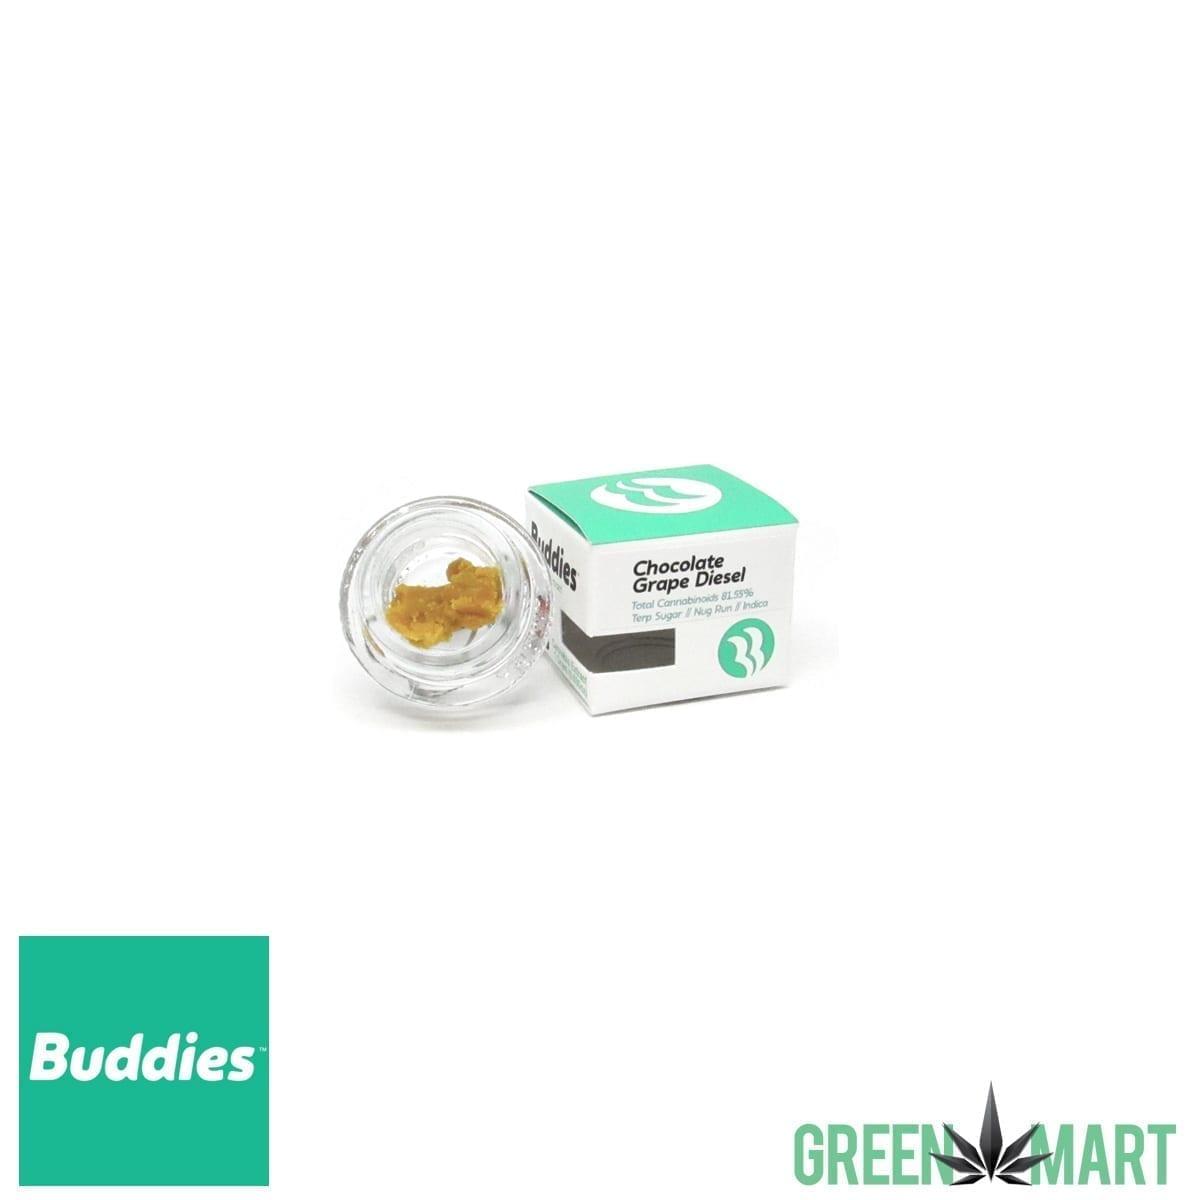 Buddies Brand Terp Sugar - Chocolate Grape Diesel